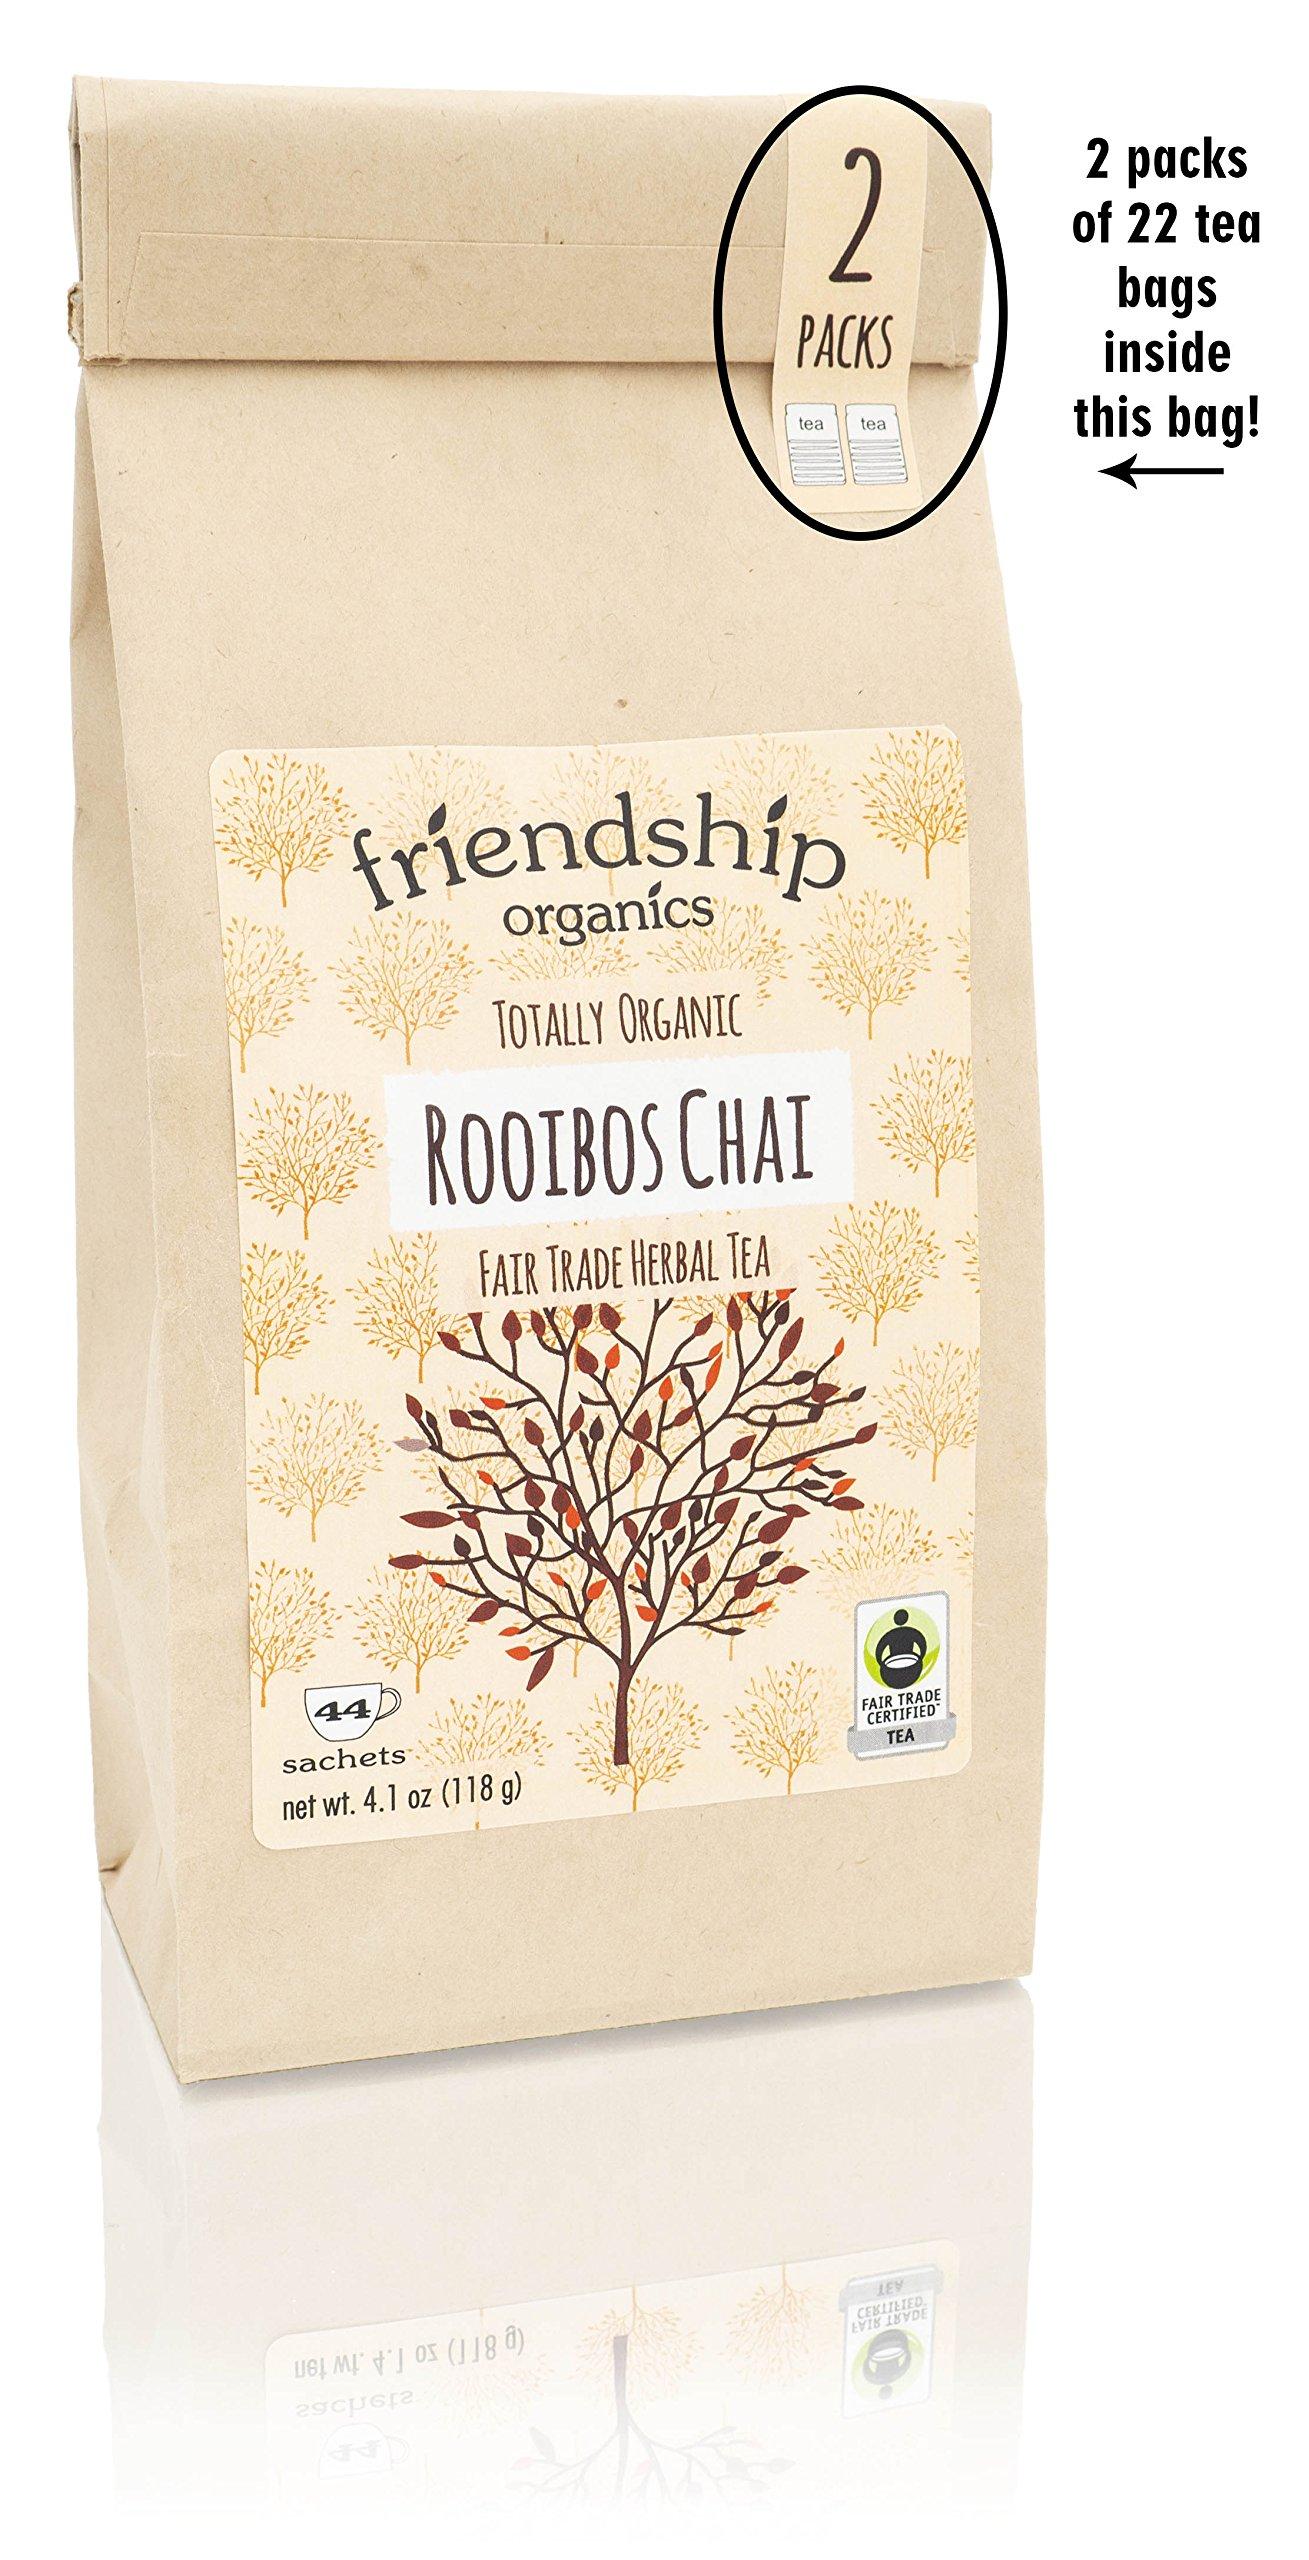 Organic Rooibos Chai, Fair Trade Certified Herbal Tea - Tagless teabags (44 count)